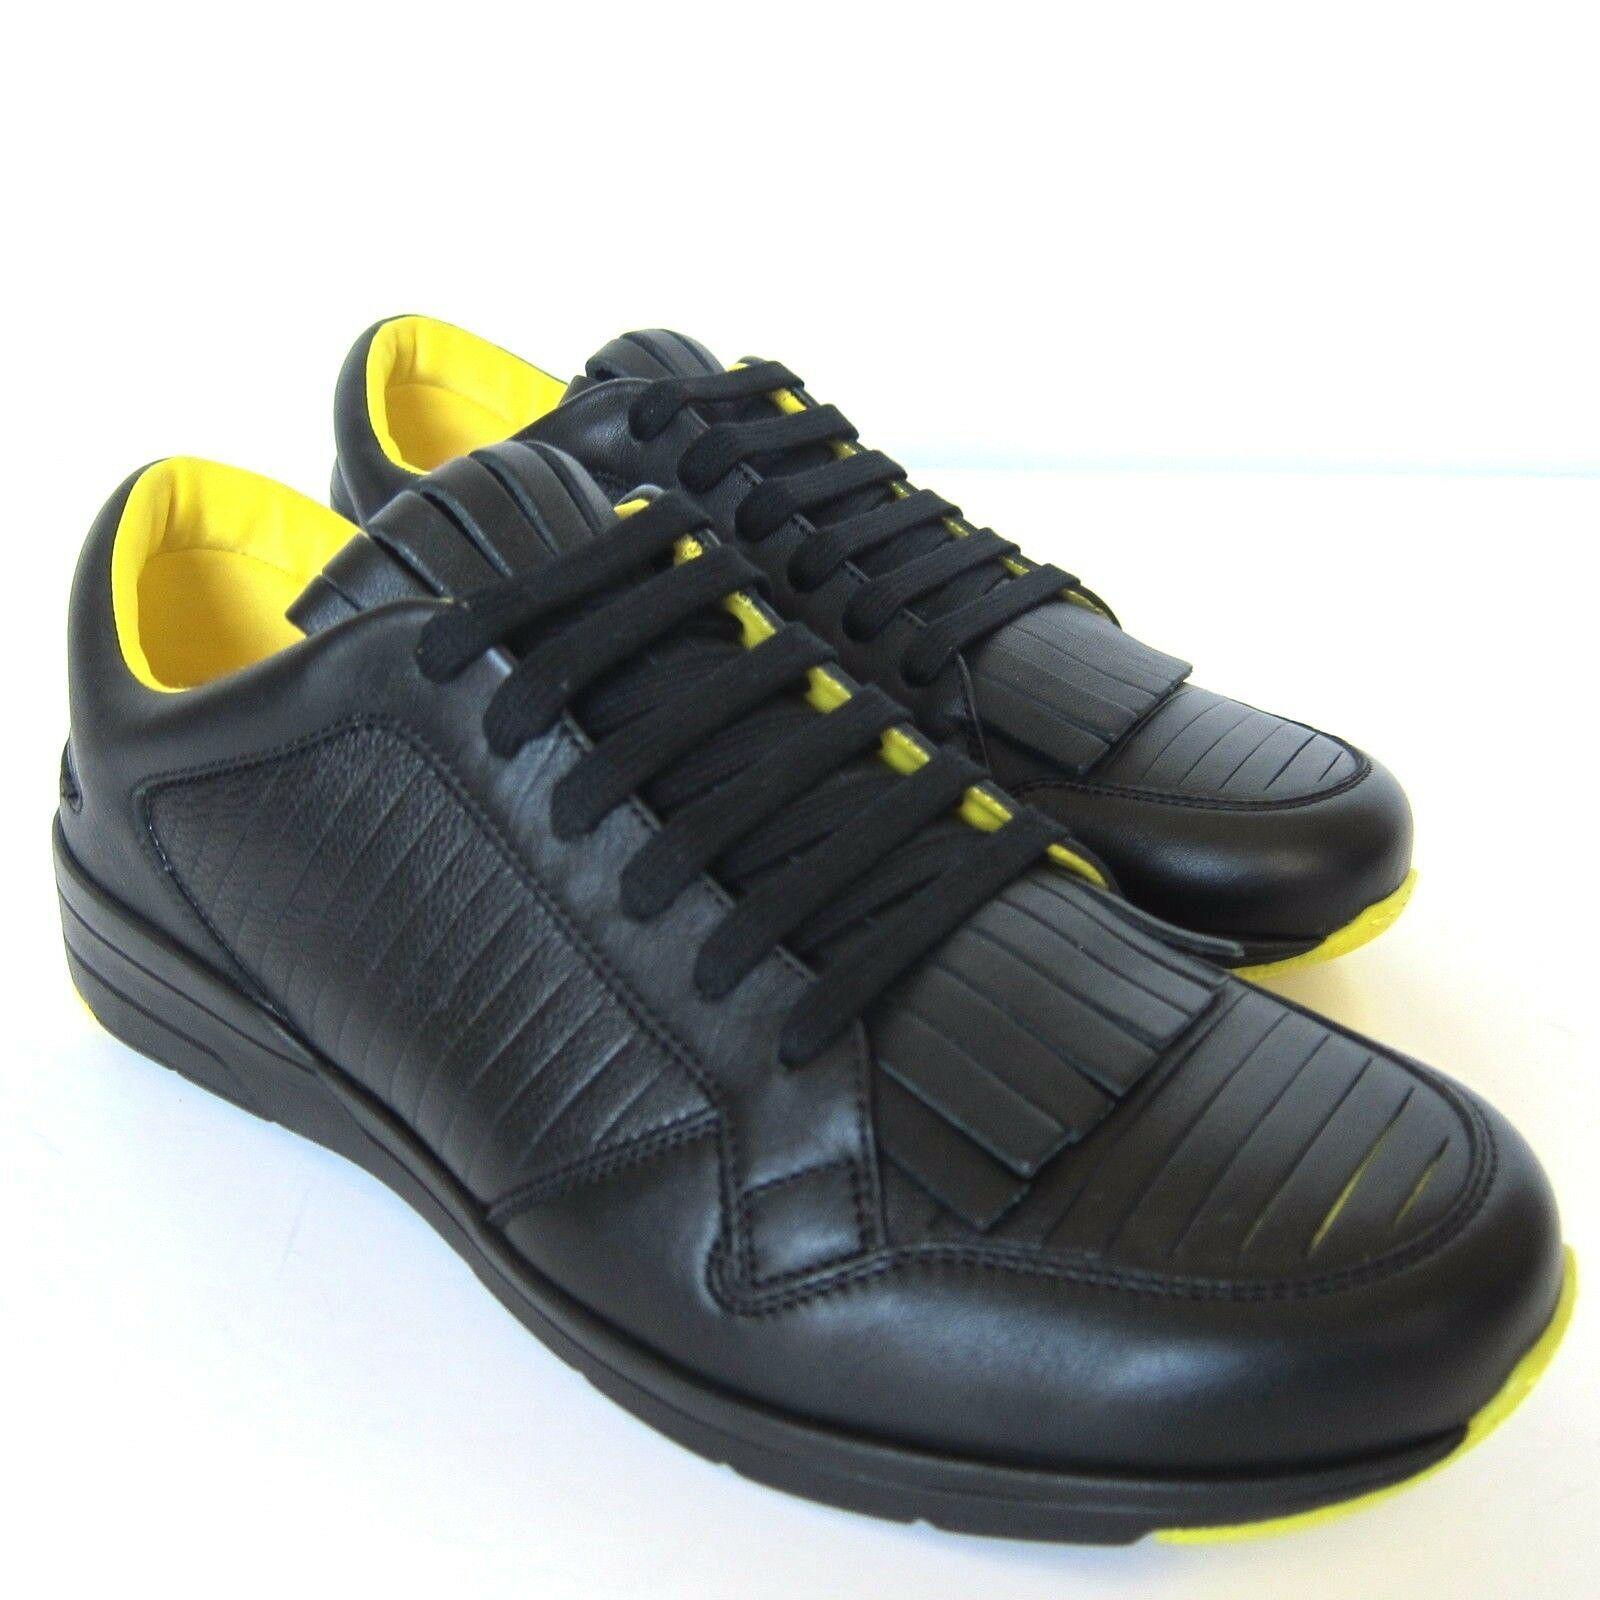 b5c630019ed W-1026189 New Gucci Miro Soft Black Leather Brava Runner Marked Size 9 US-10  -  237.49